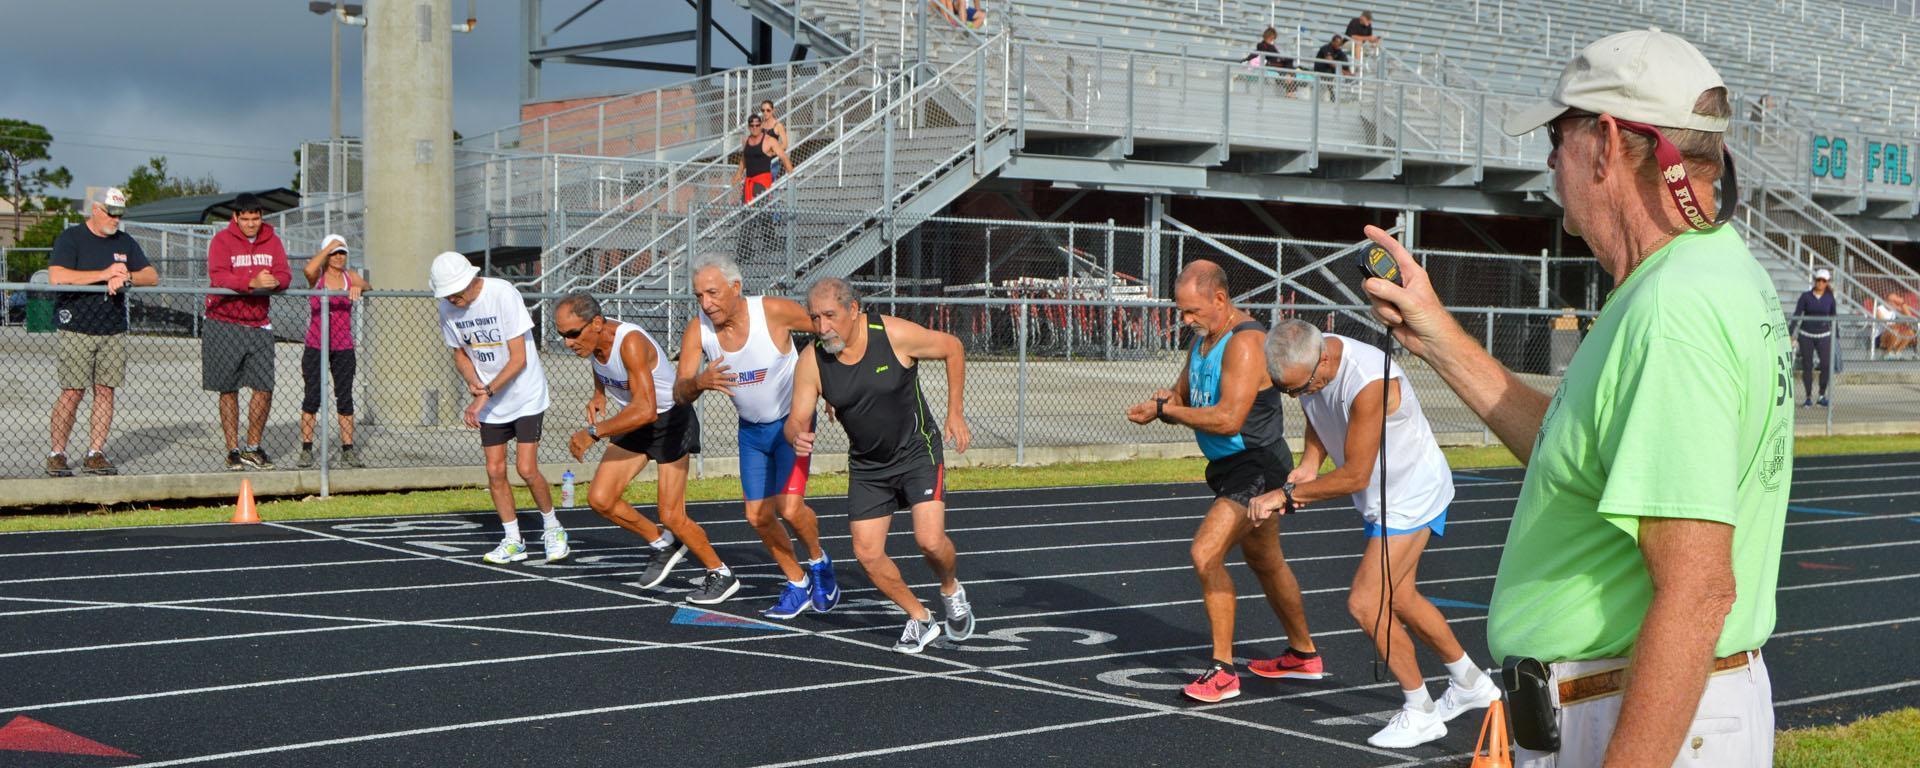 Martin County Senior Games